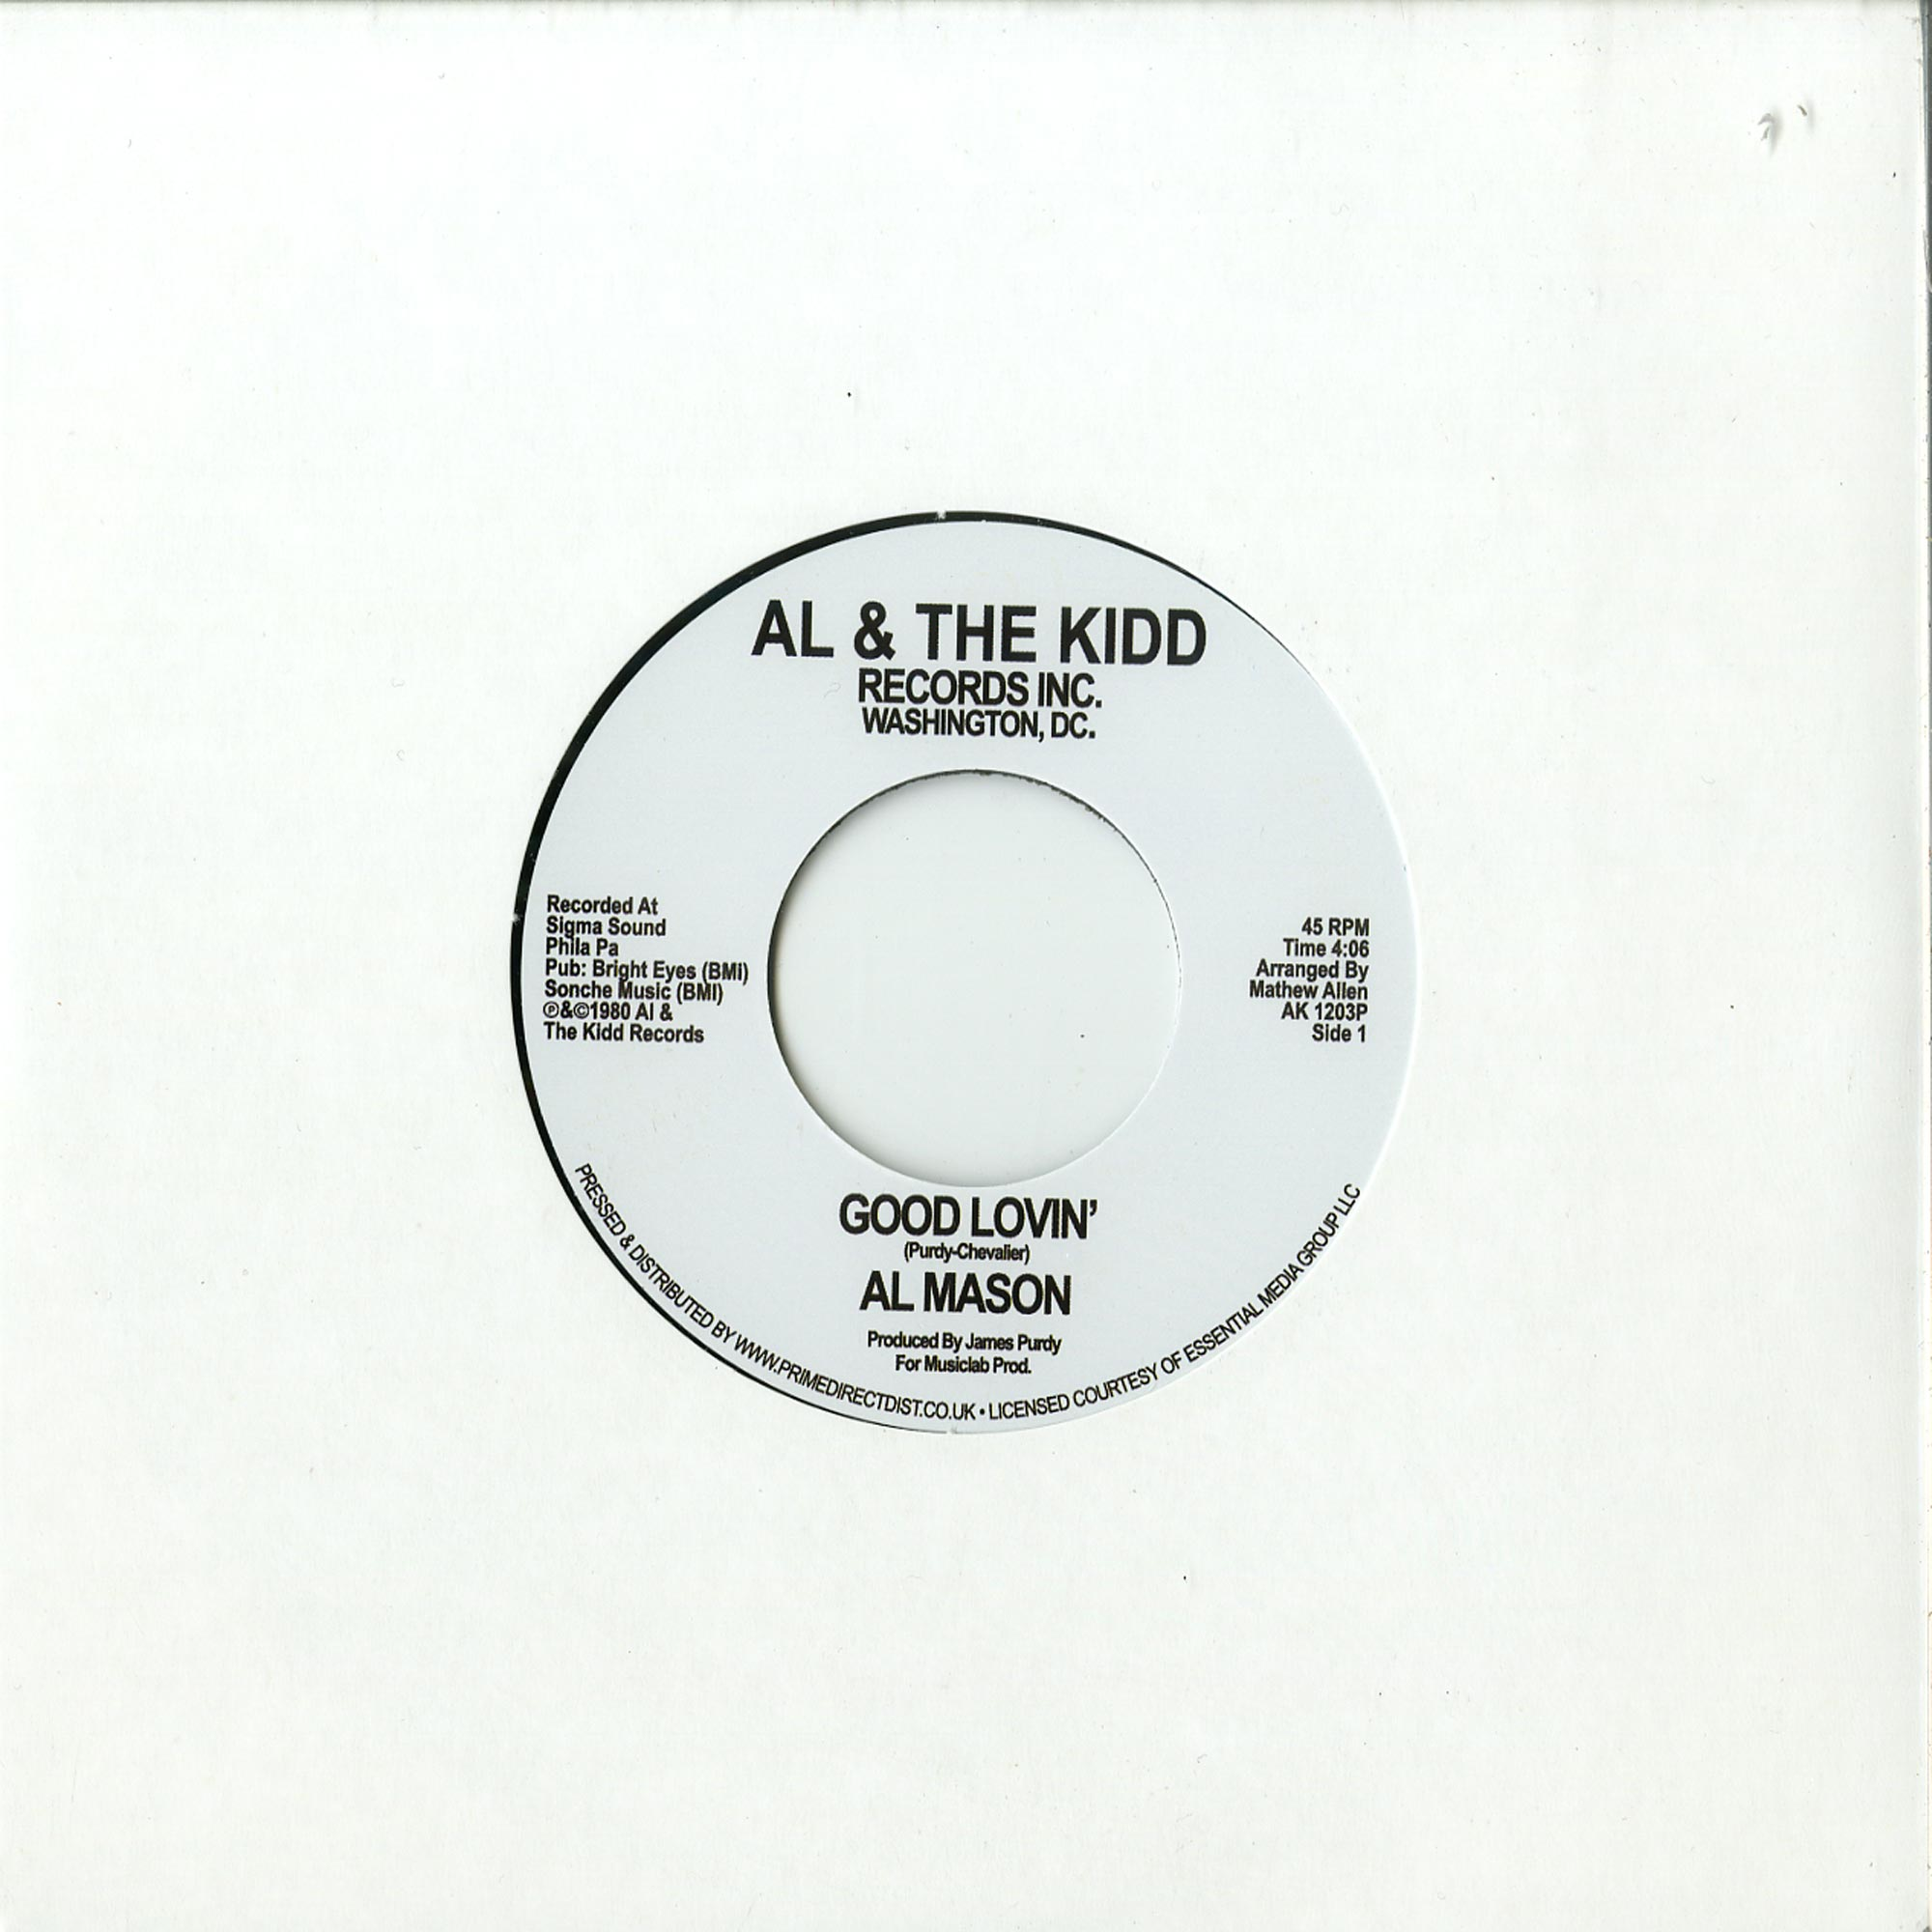 Al Mason - GOOD LOVIN / WE STILL COULD BE TOGETHER